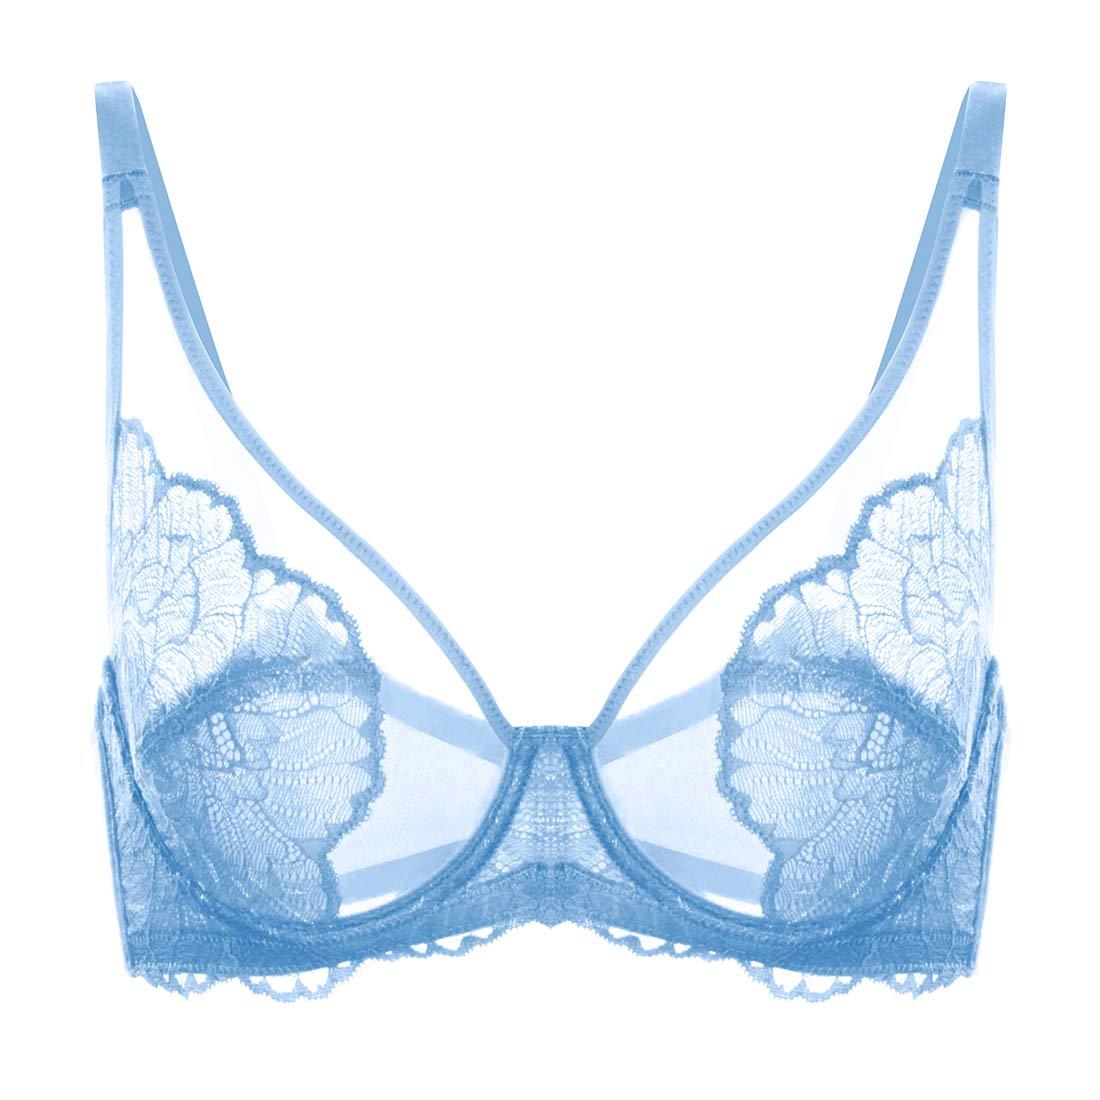 HSIA Women's Minimizer Bra Unlined Underwire Full Figure Lace Bra Plus Size Full Coverage Unpadded Bra 34C-44DDD